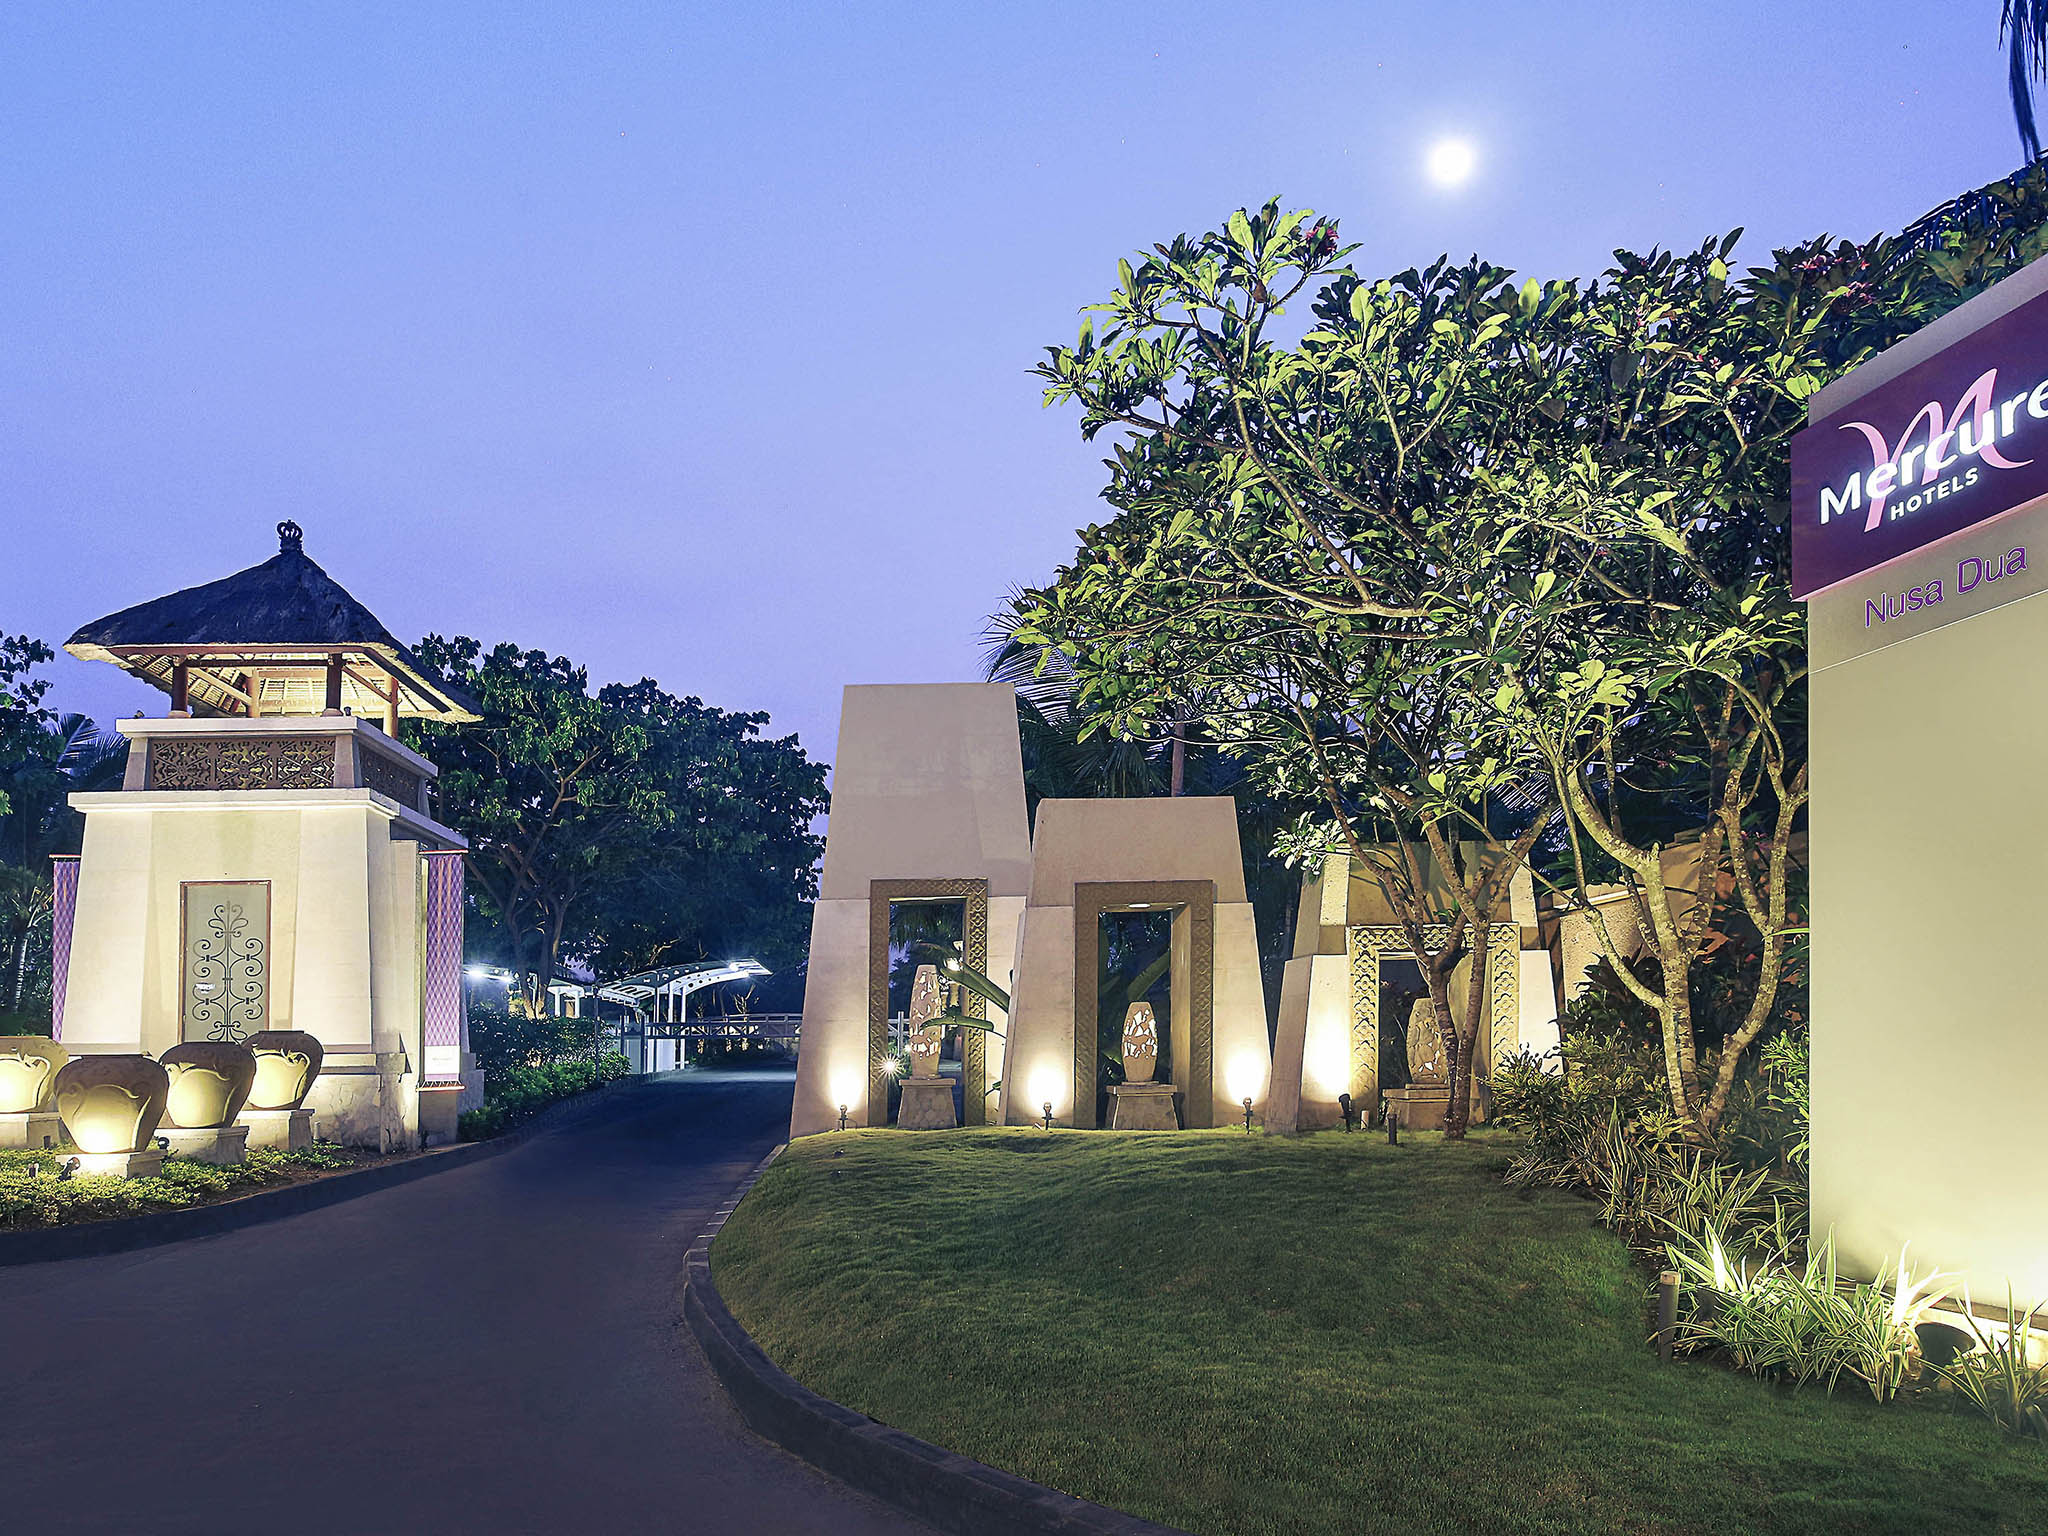 Mercure Bali Nusa Dua Business Leisure Accorhotels